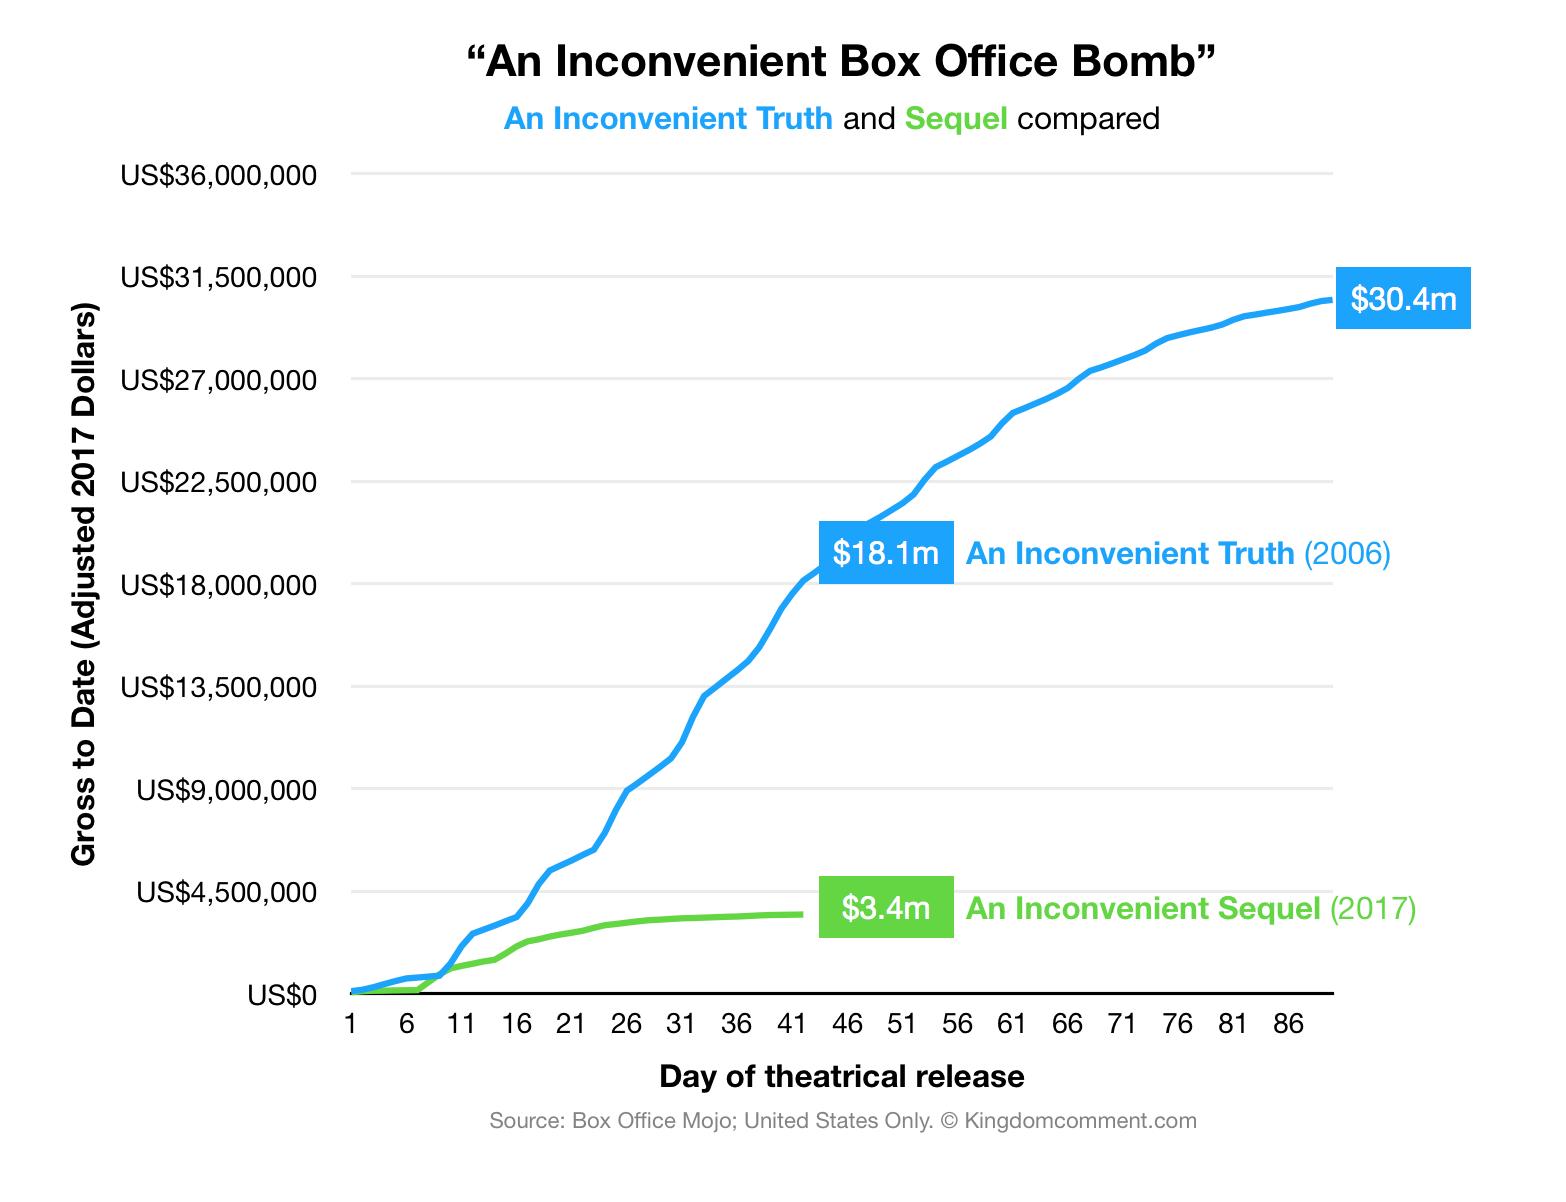 AnInconvenientBoxOfficeBomb.png